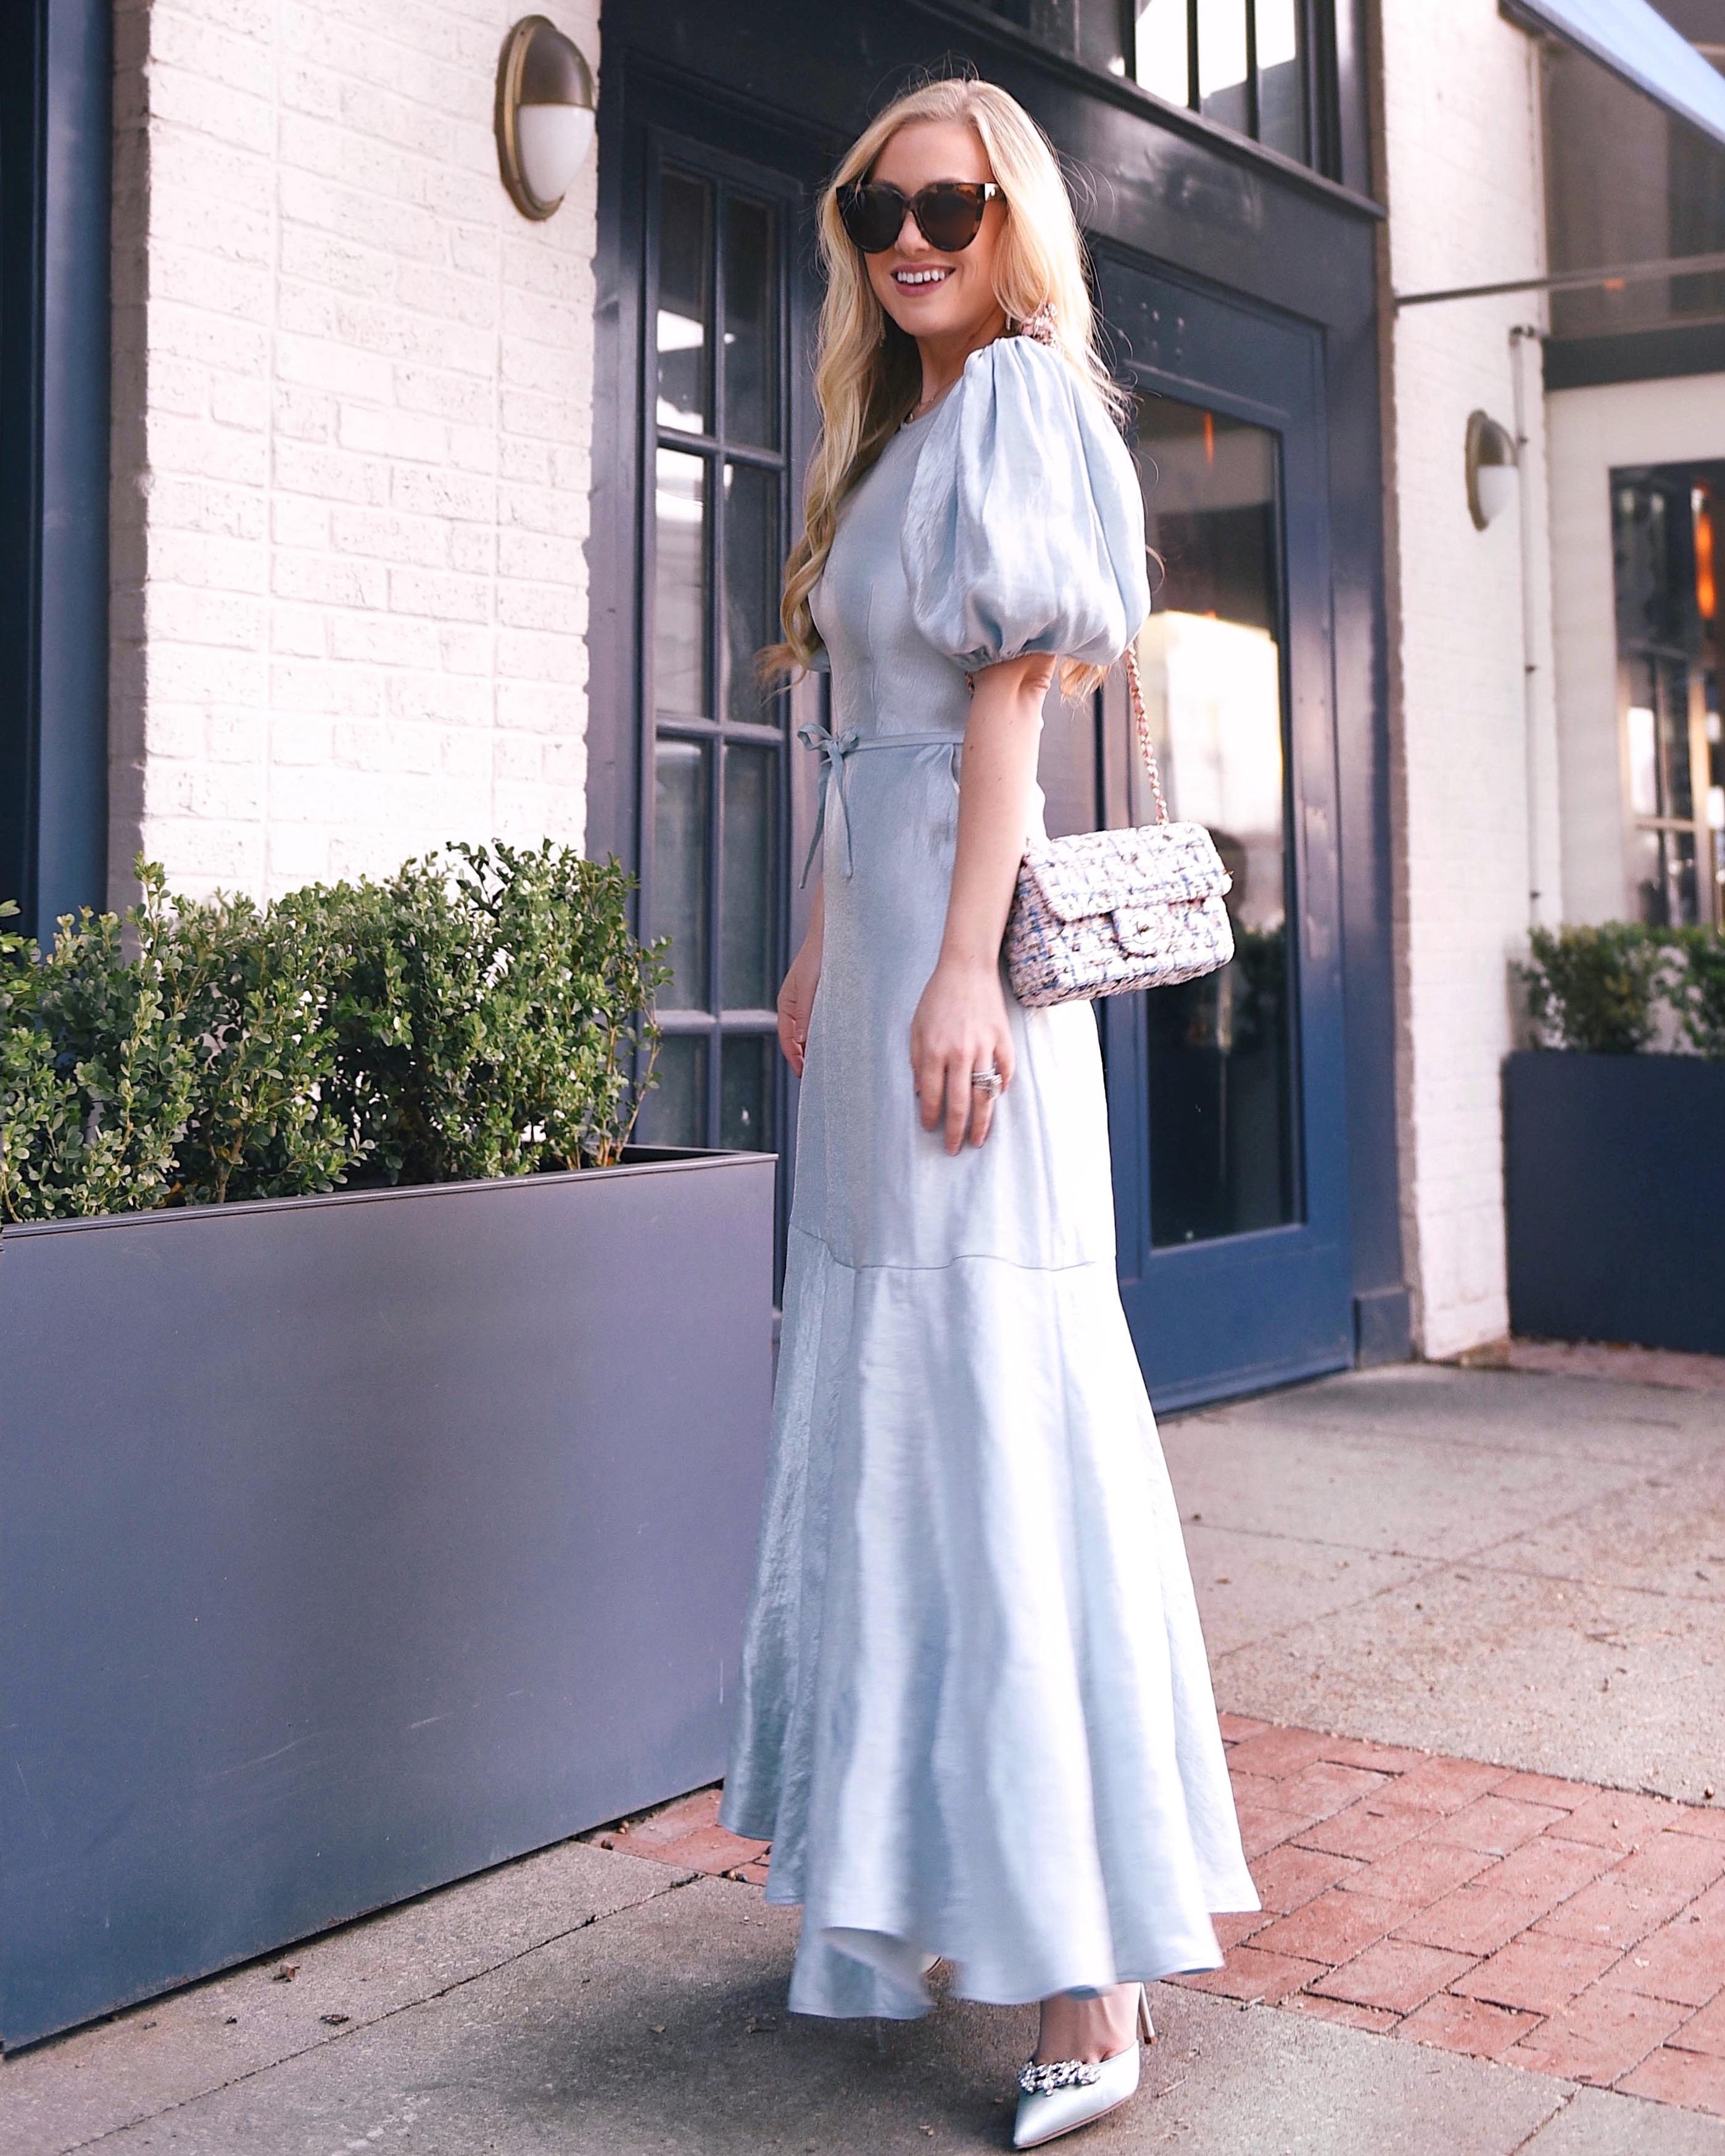 Lo-Murphy-Blue-Dress-Chanel-Handbag-Manolo-Blahnik-Lurum-Dallas-Blogger-Style-Blogger